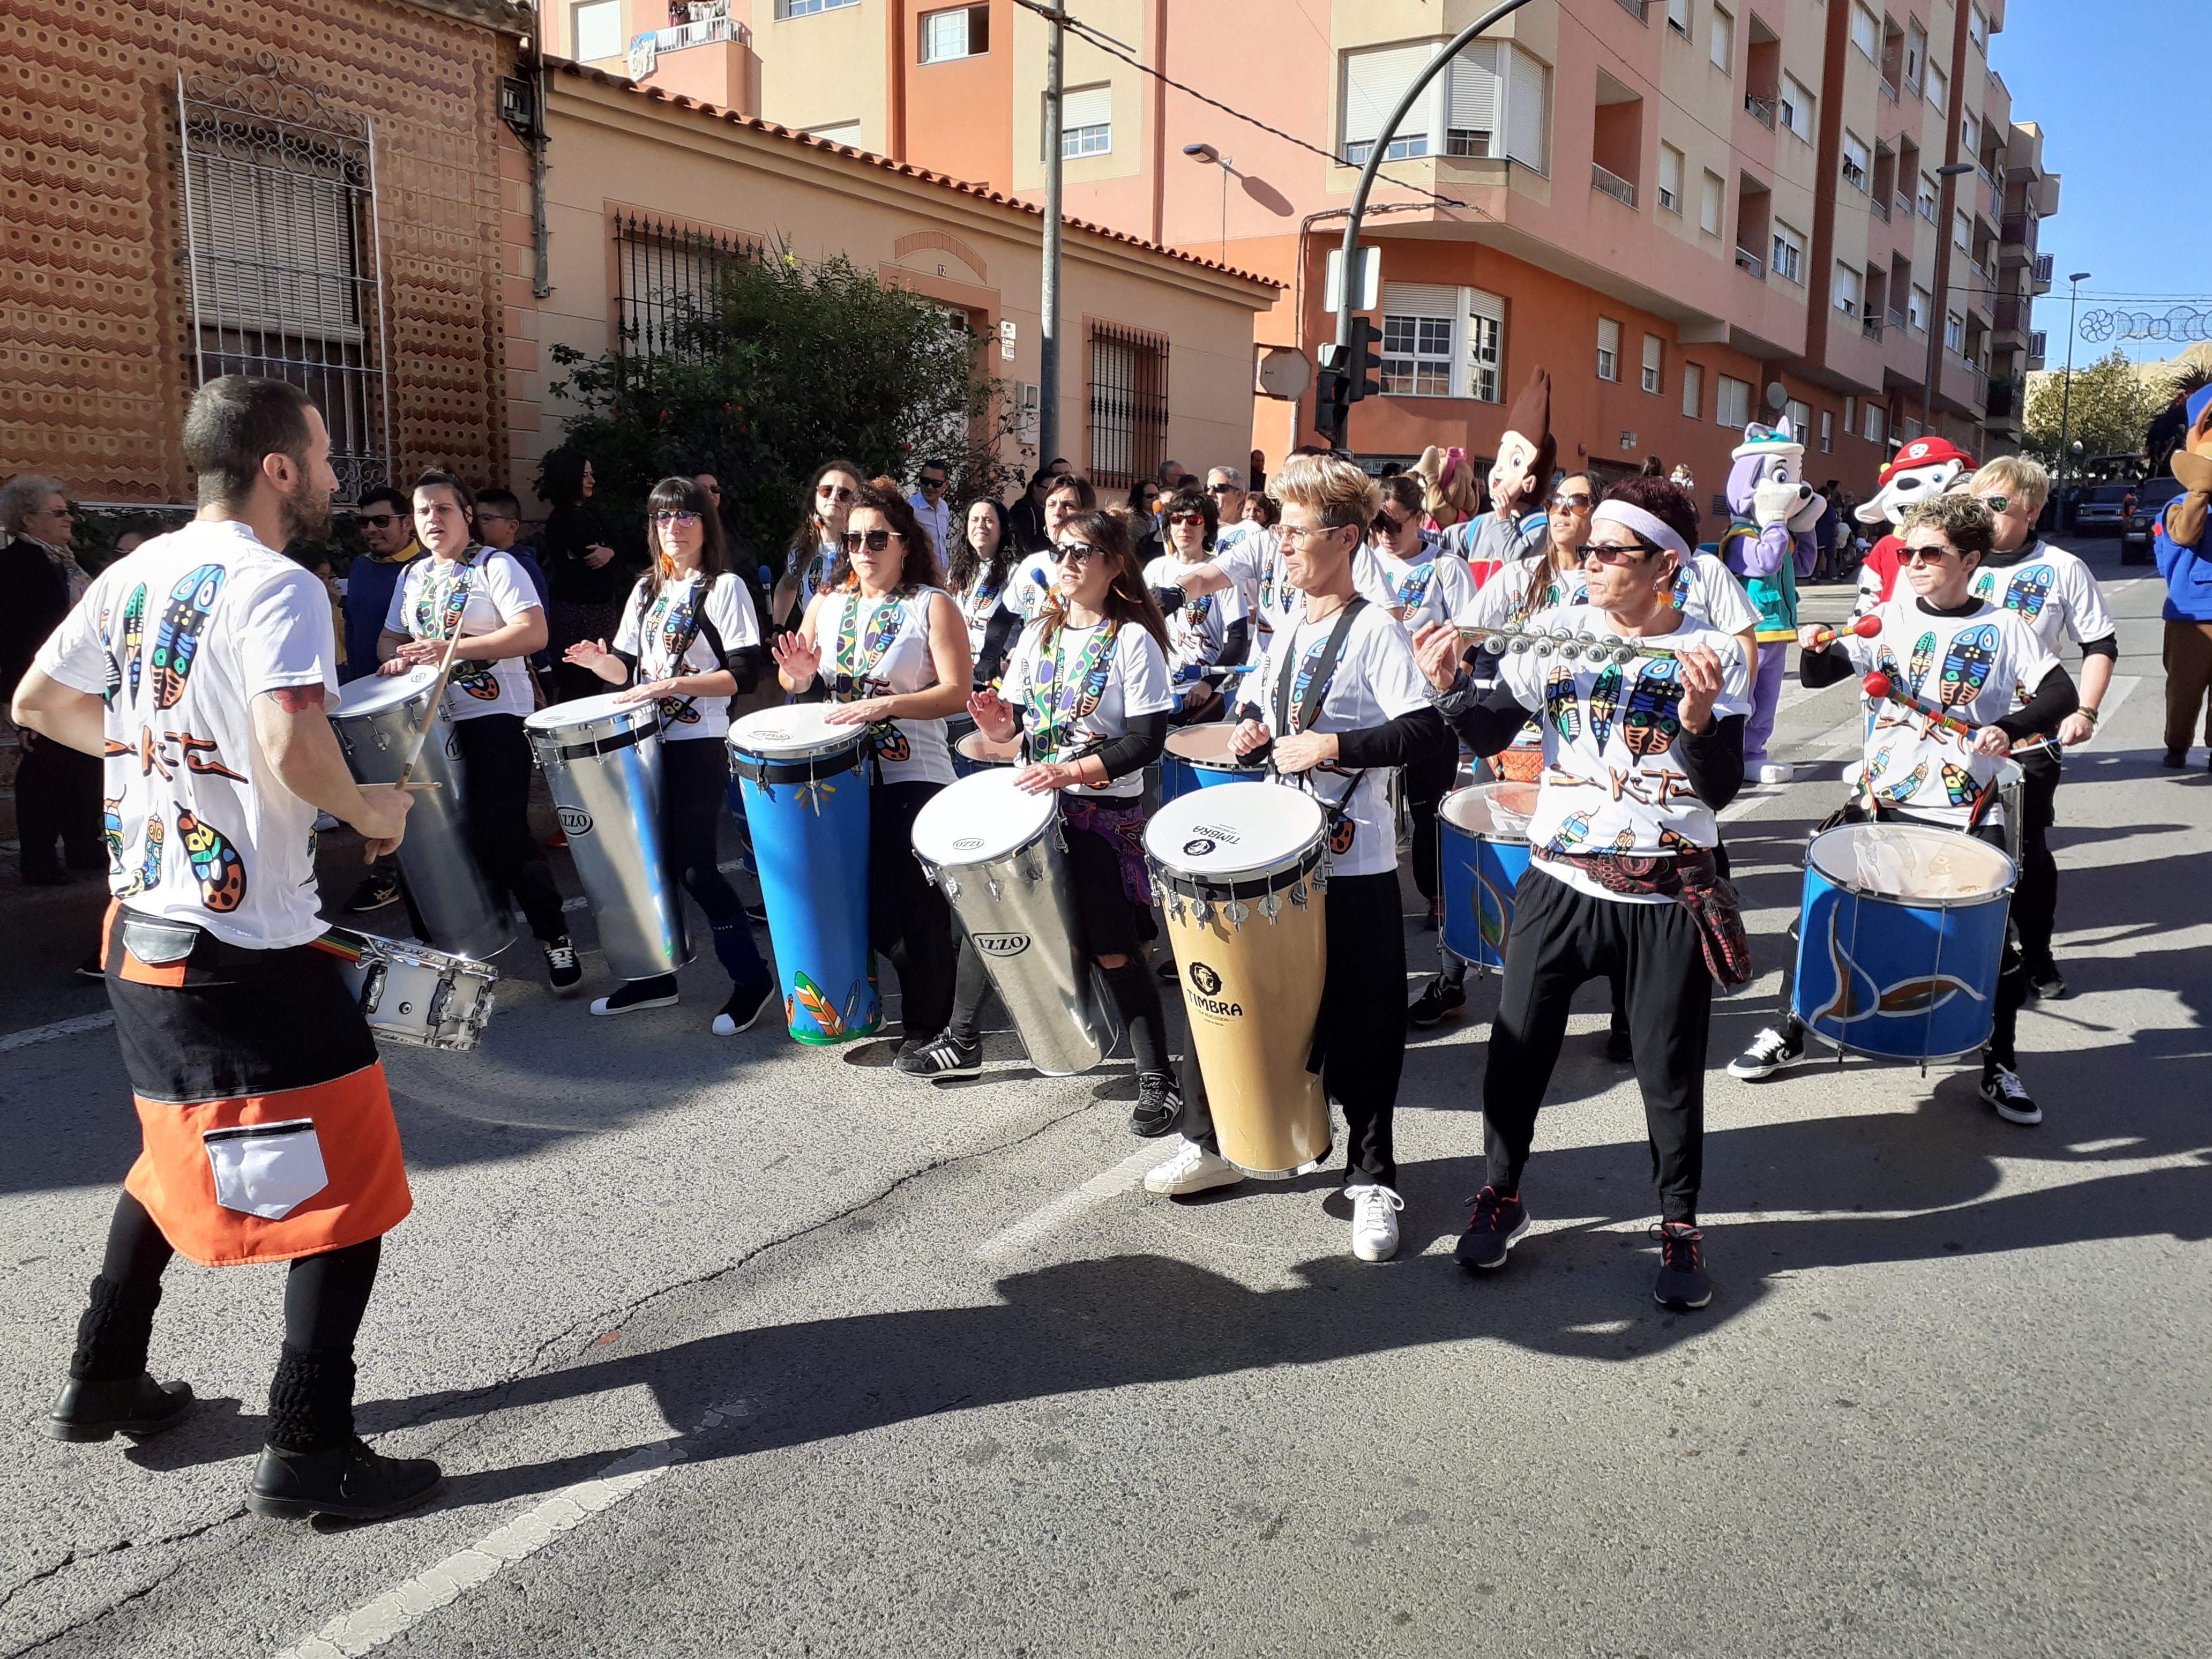 Murcia y ritmo